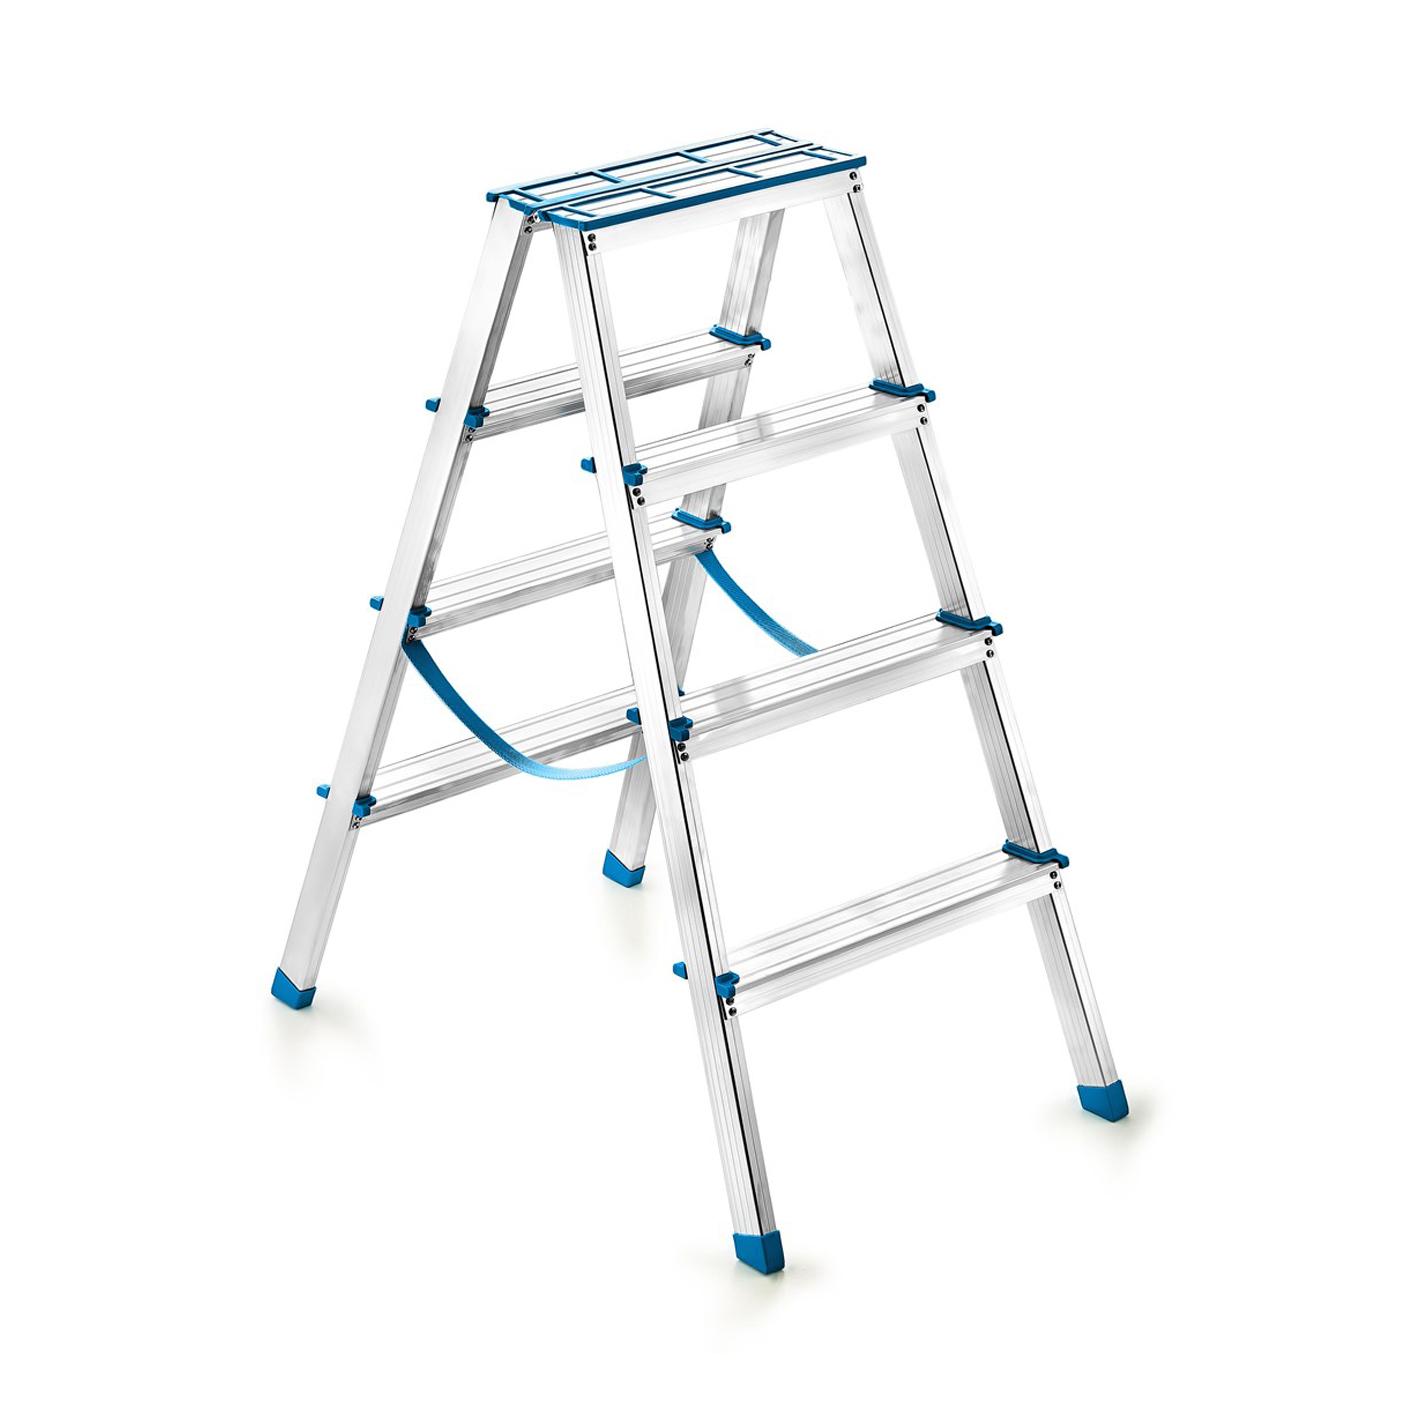 Perilla 4+4 Çift Çıkışlı Alüminyum Merdiven